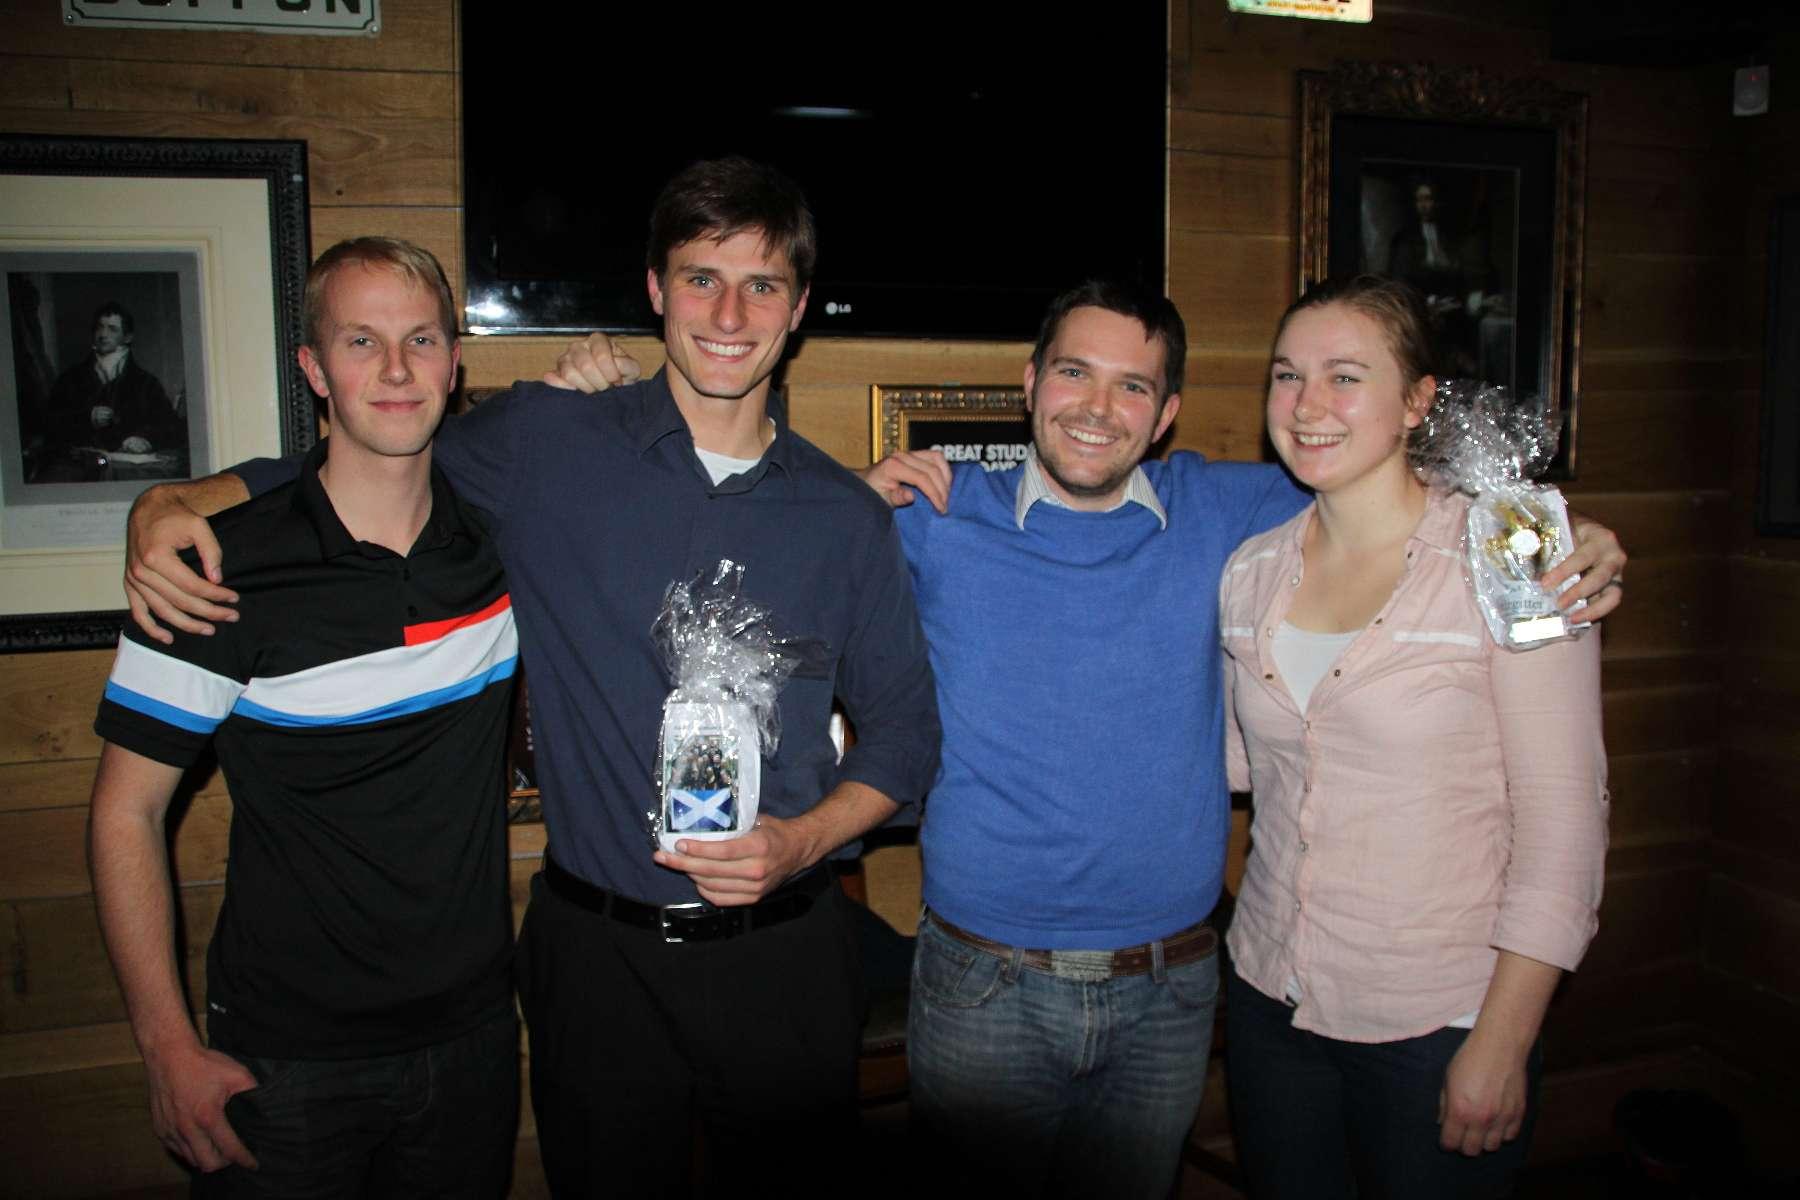 Treffen mit dem Edinburgh City Men's Lacrosse Team